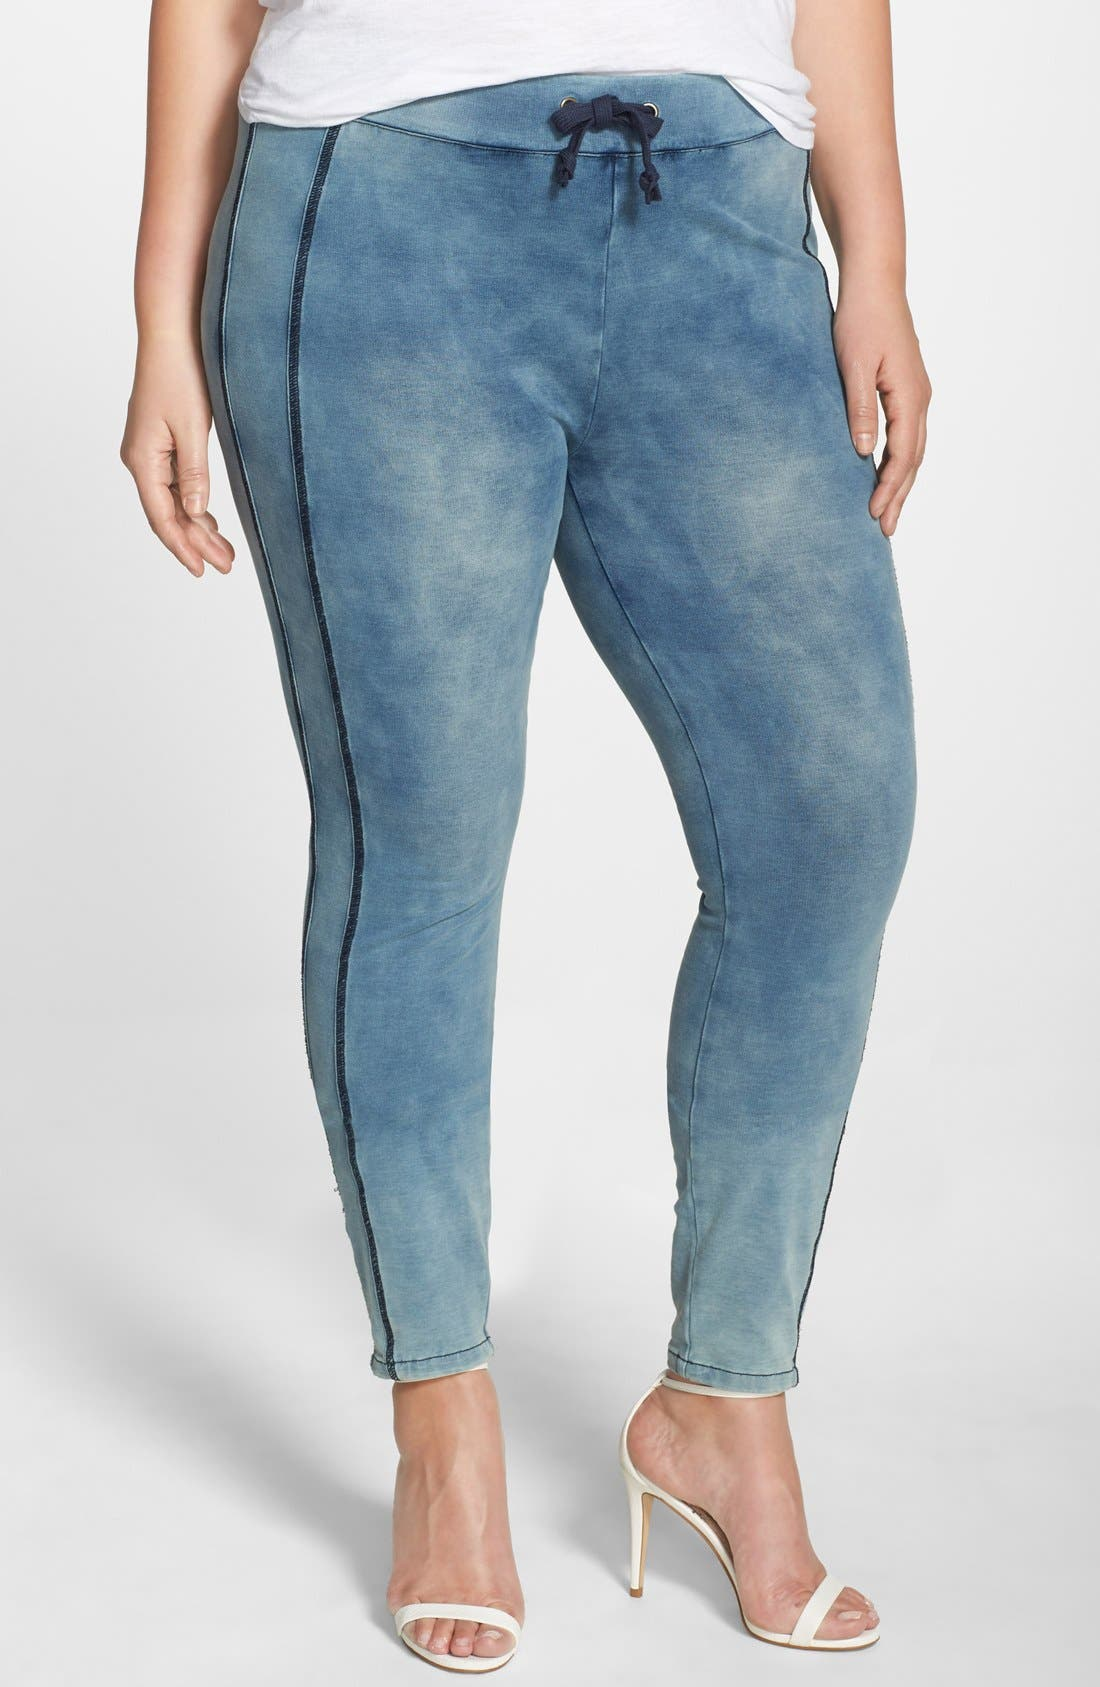 'Naomi' Stretch Knit Denim Jogger Pants,                         Main,                         color, NOEL